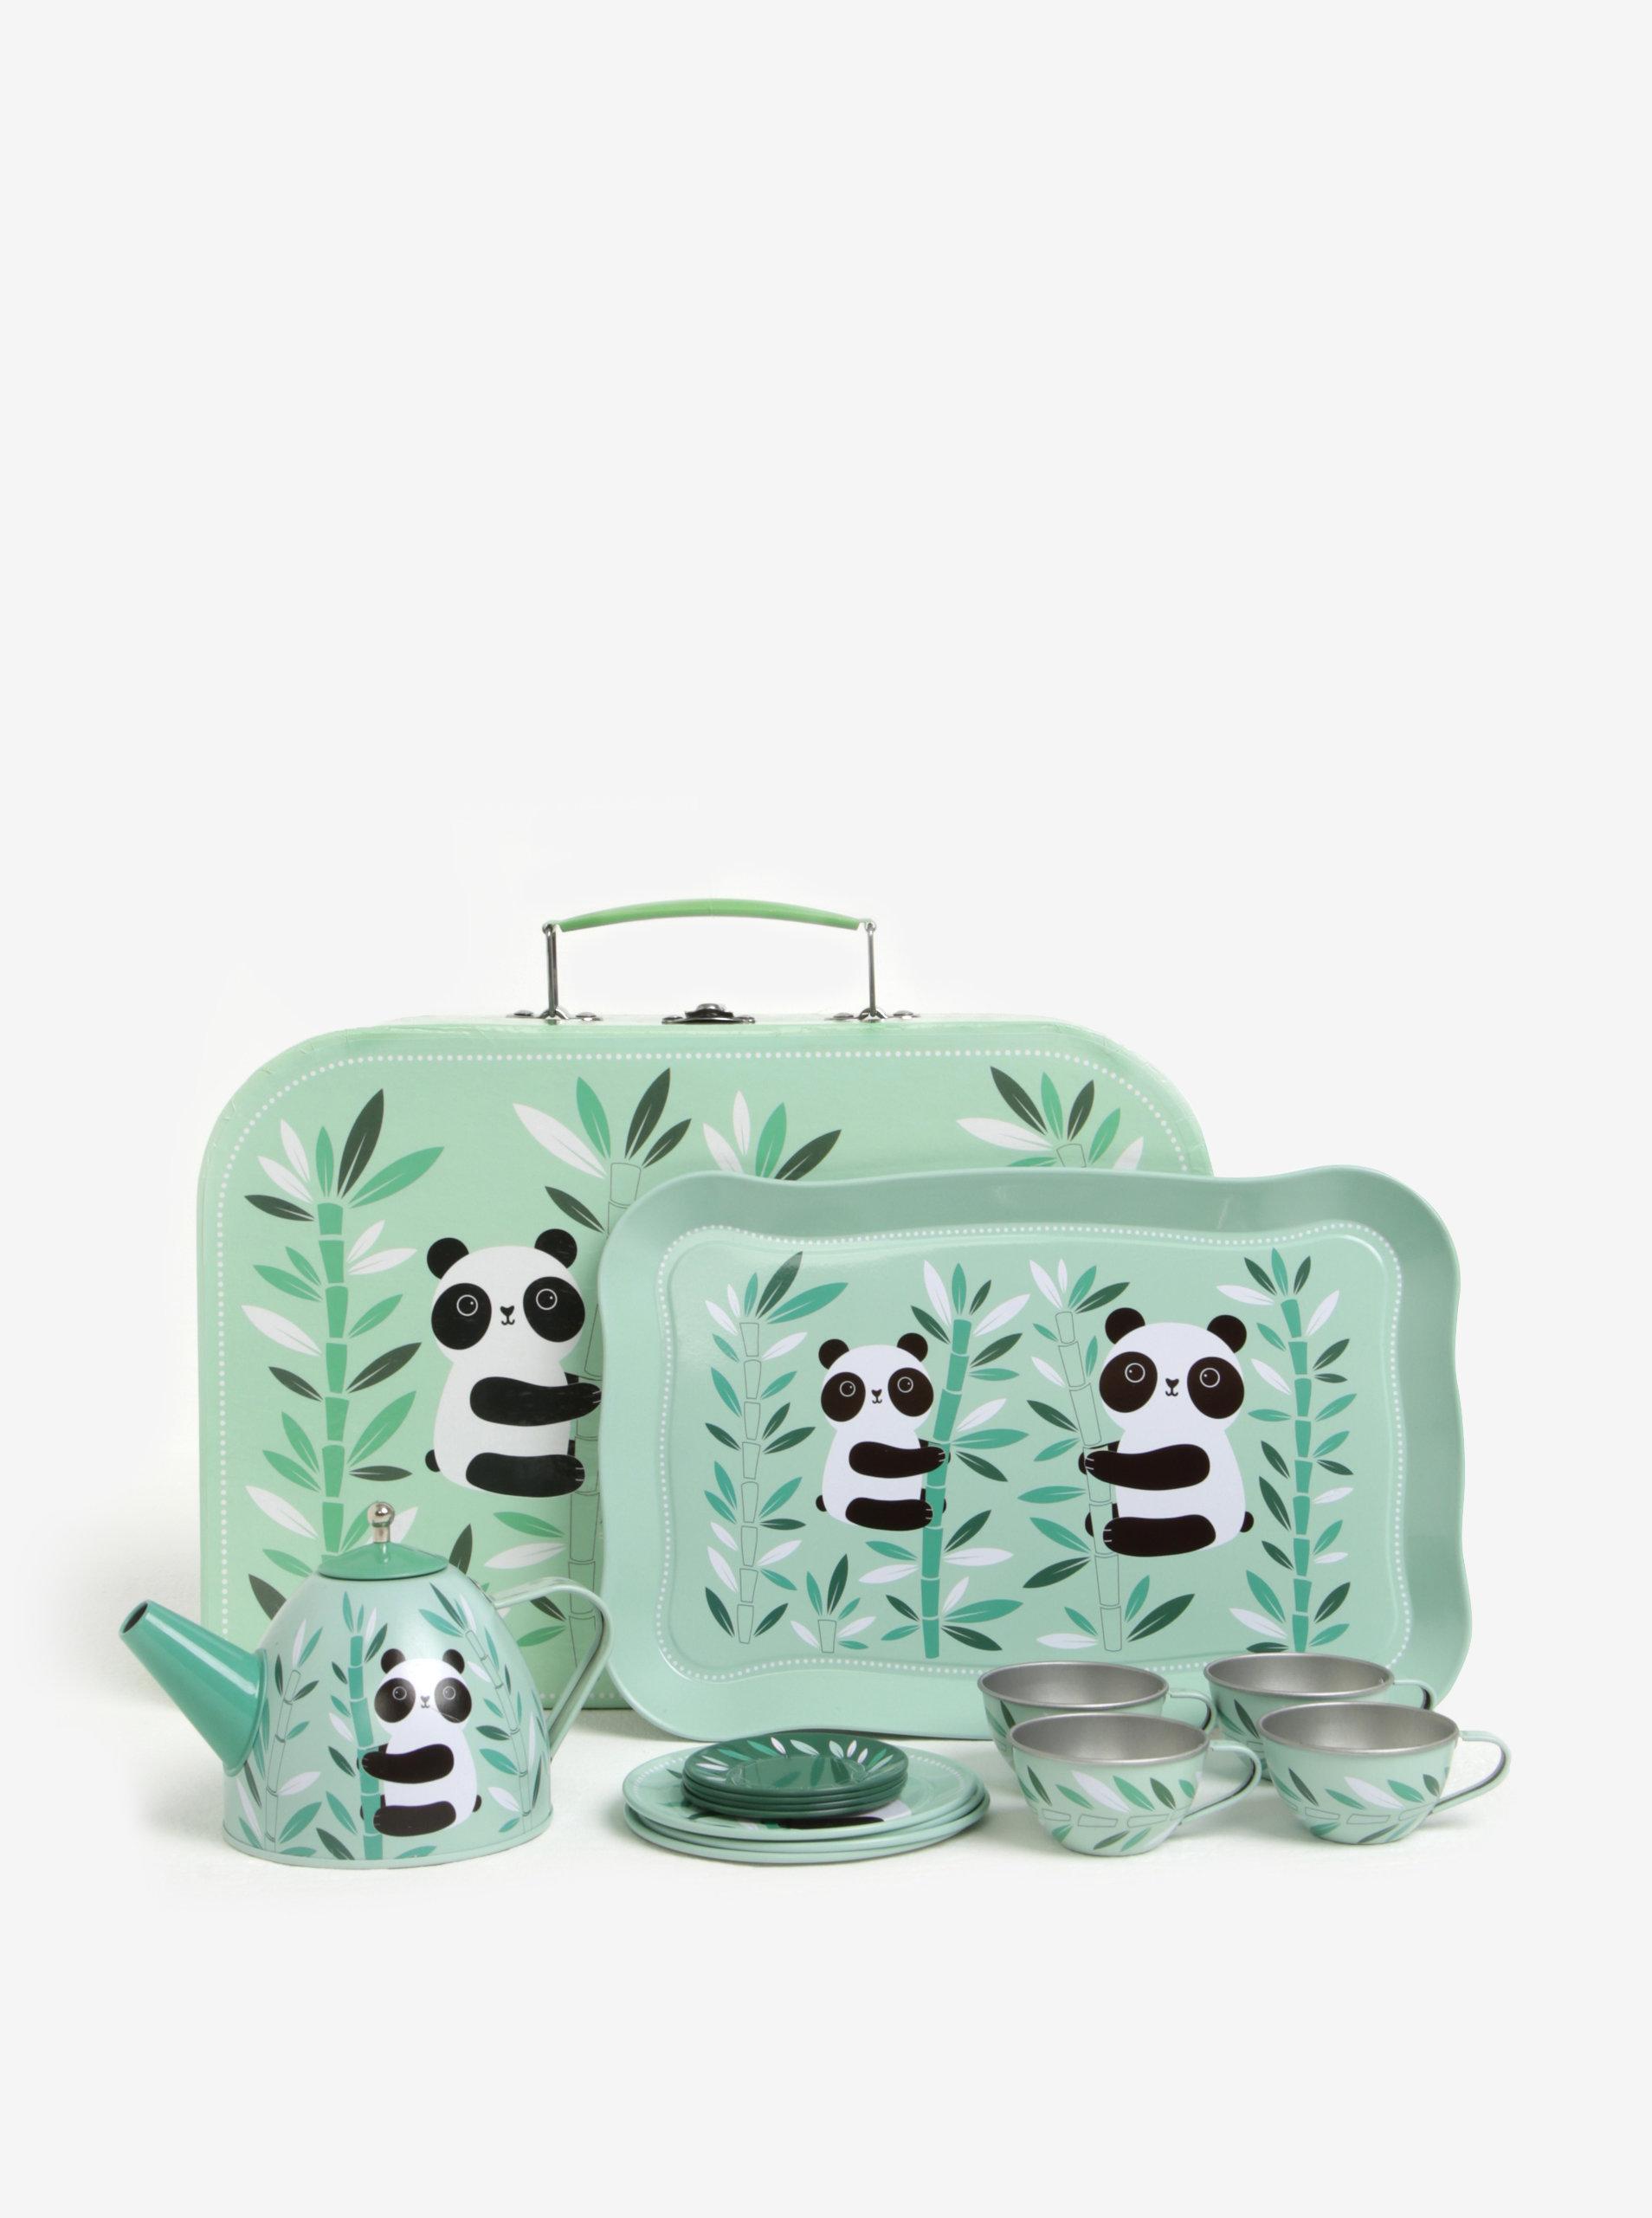 eb892354661e8 Zelená detská čajová súprava s motívom pandy Sass & Belle Aiko Panda ...